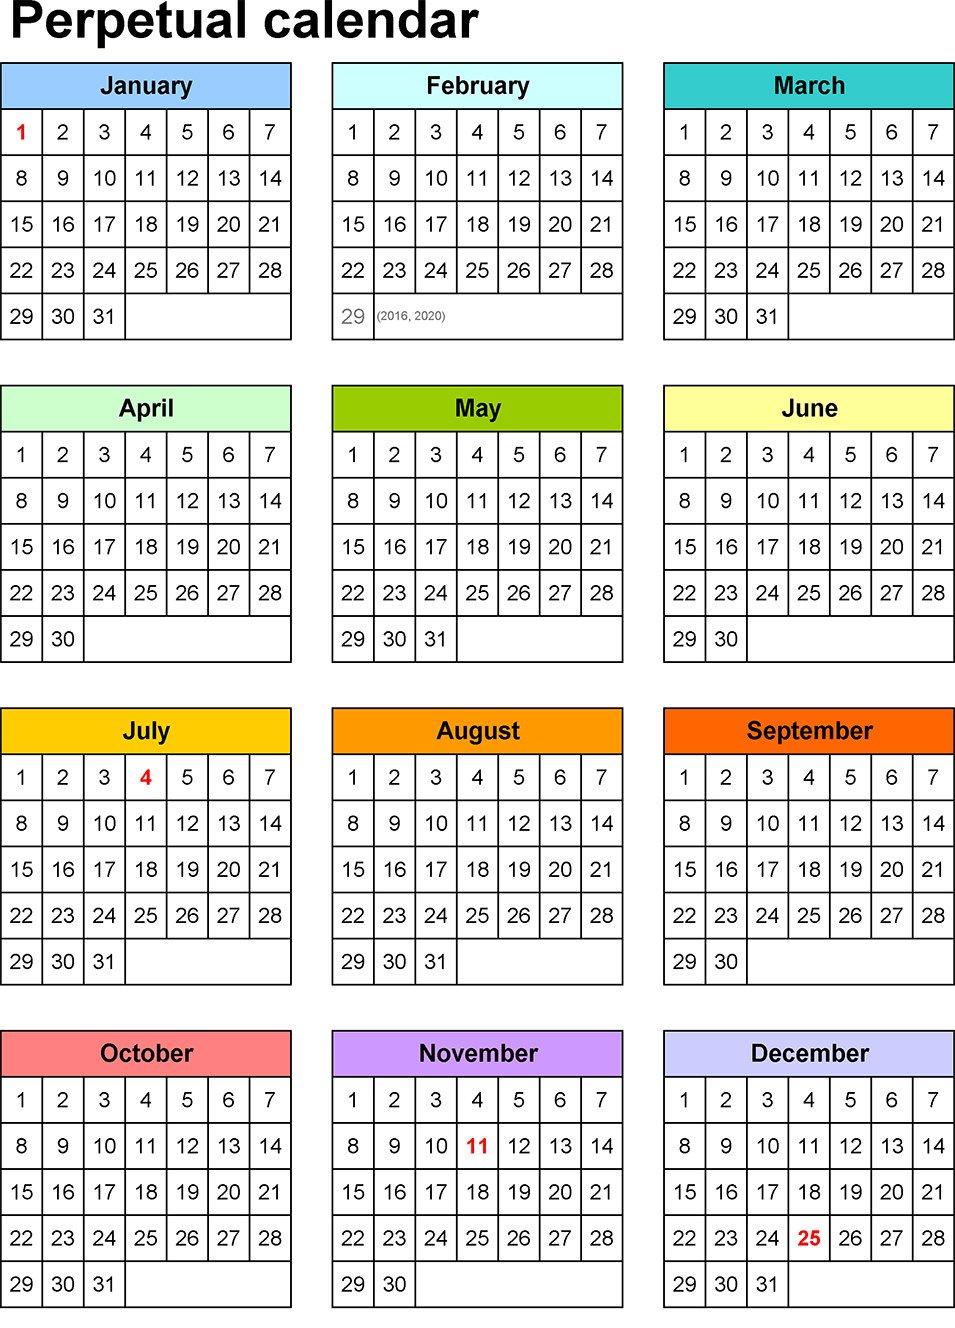 Depo+Provera+Calendar depo provera schedule calendar 2014 Success